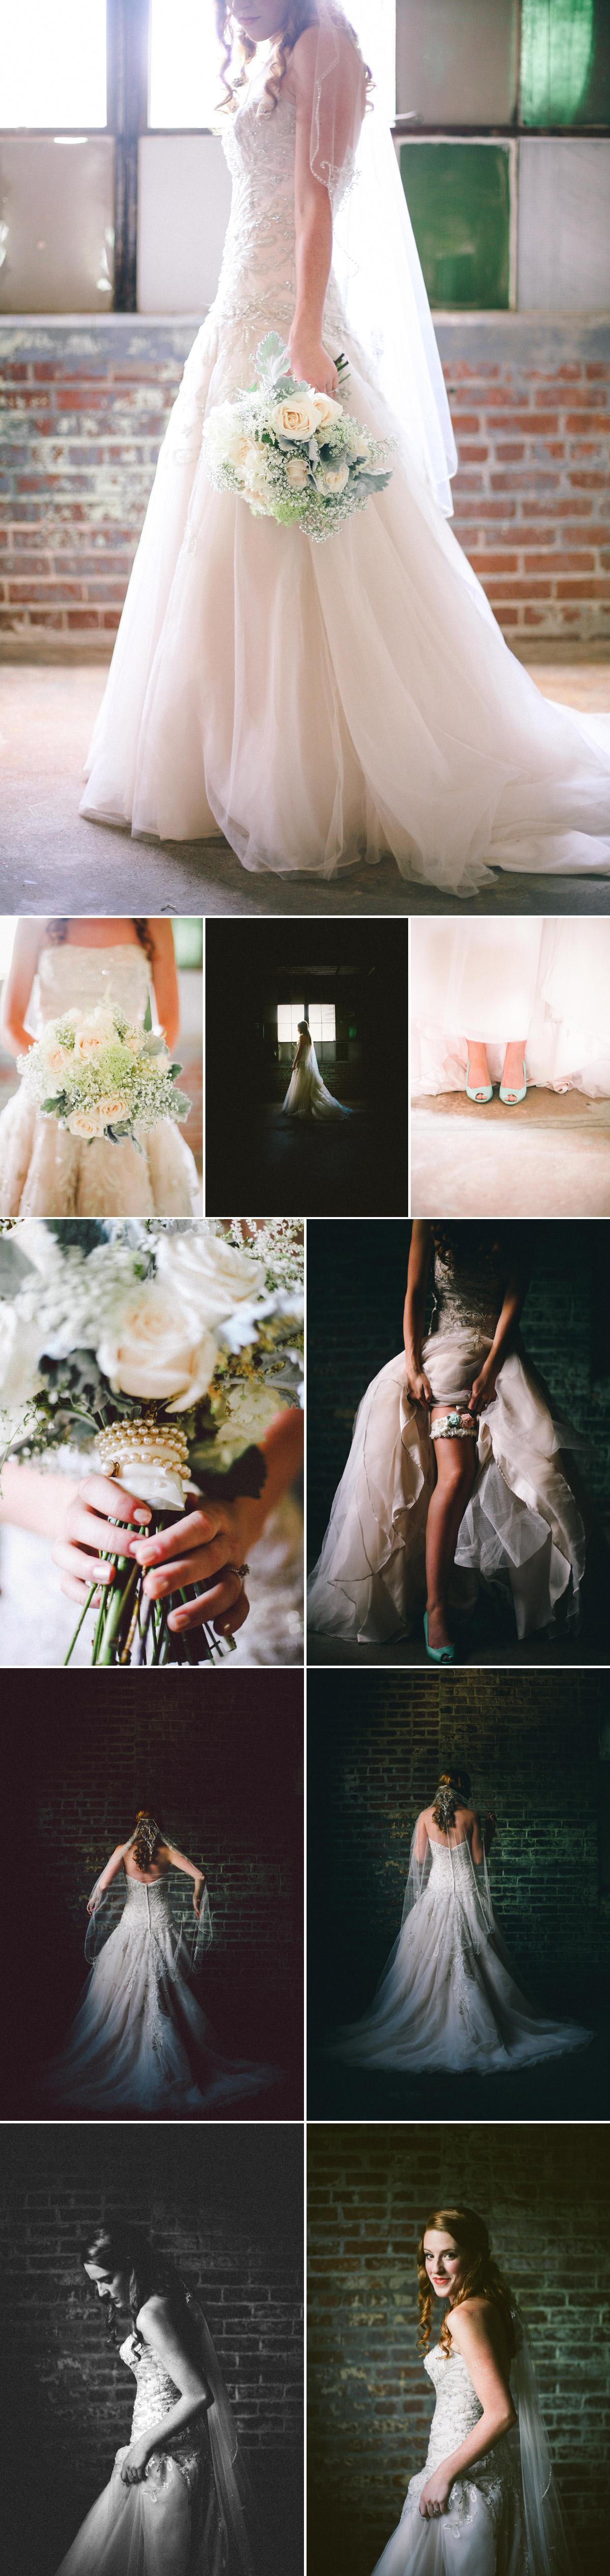 Blog-Collage-1378045028160.jpg